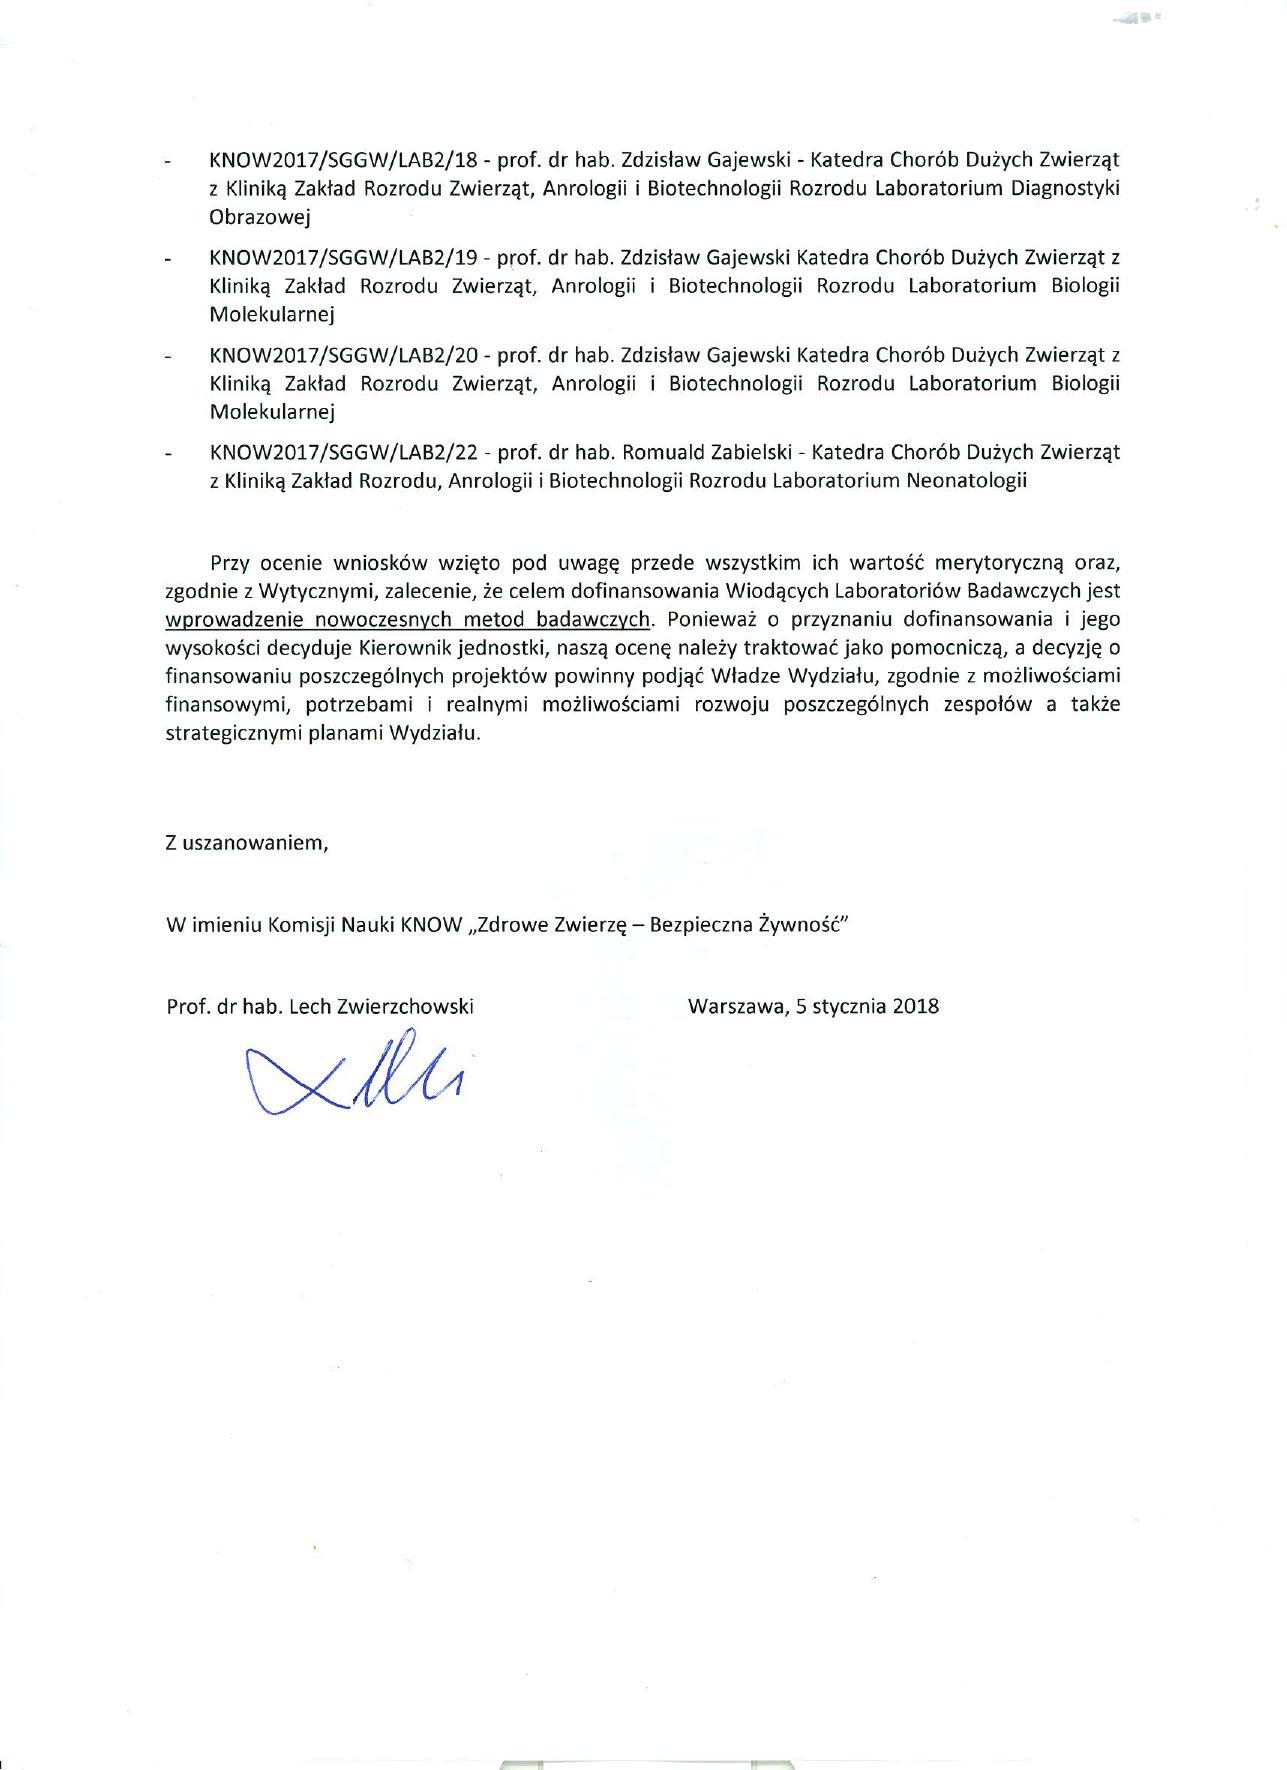 Decyzja Komisji Nauki